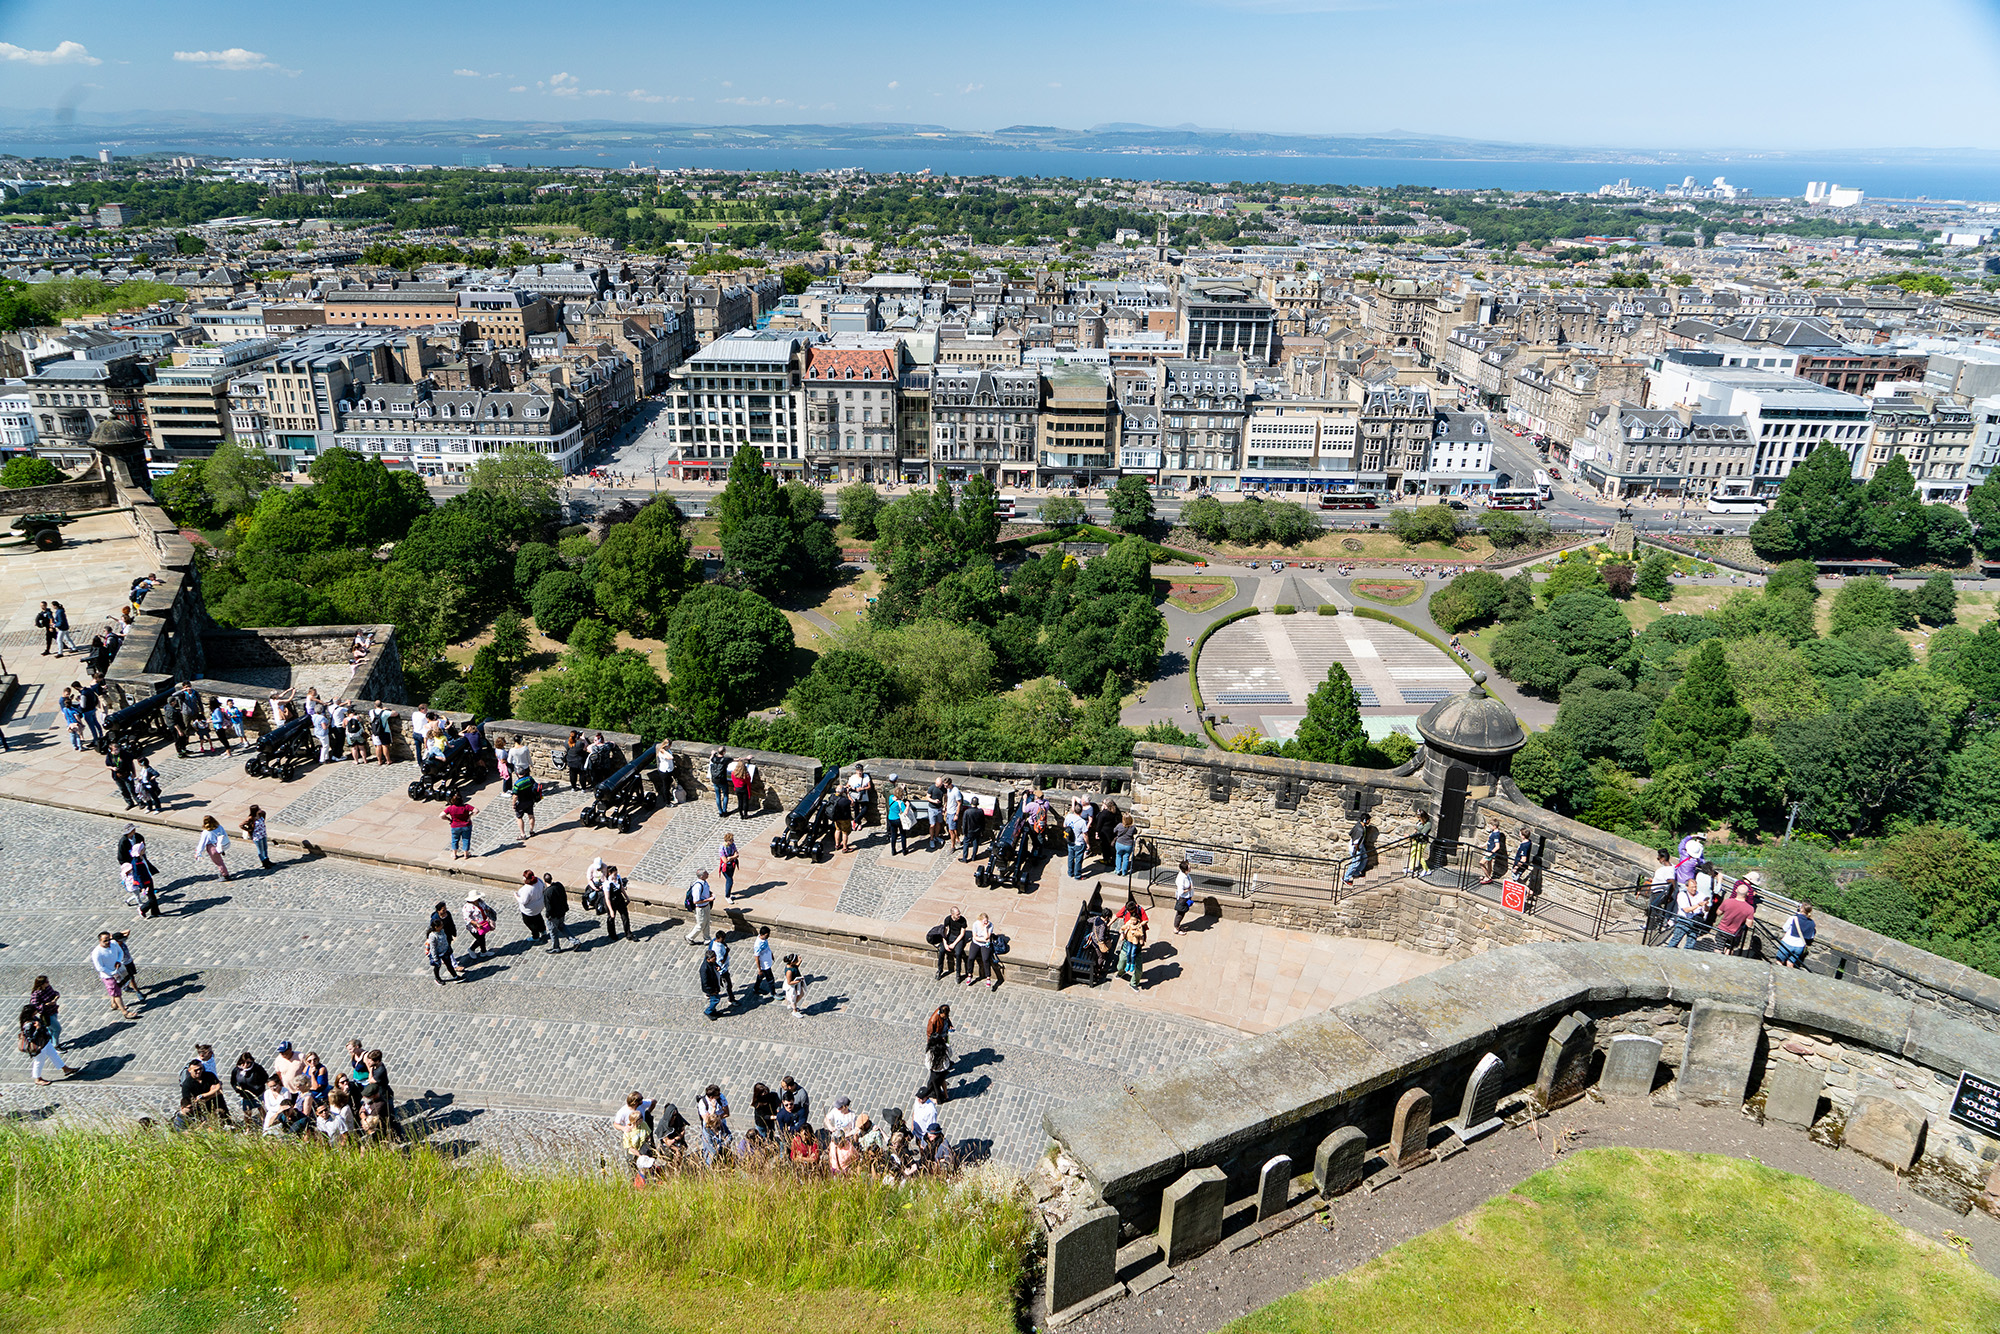 #view, #vista, #edinburgh, #castle, #clearday, #travel, #castlerock